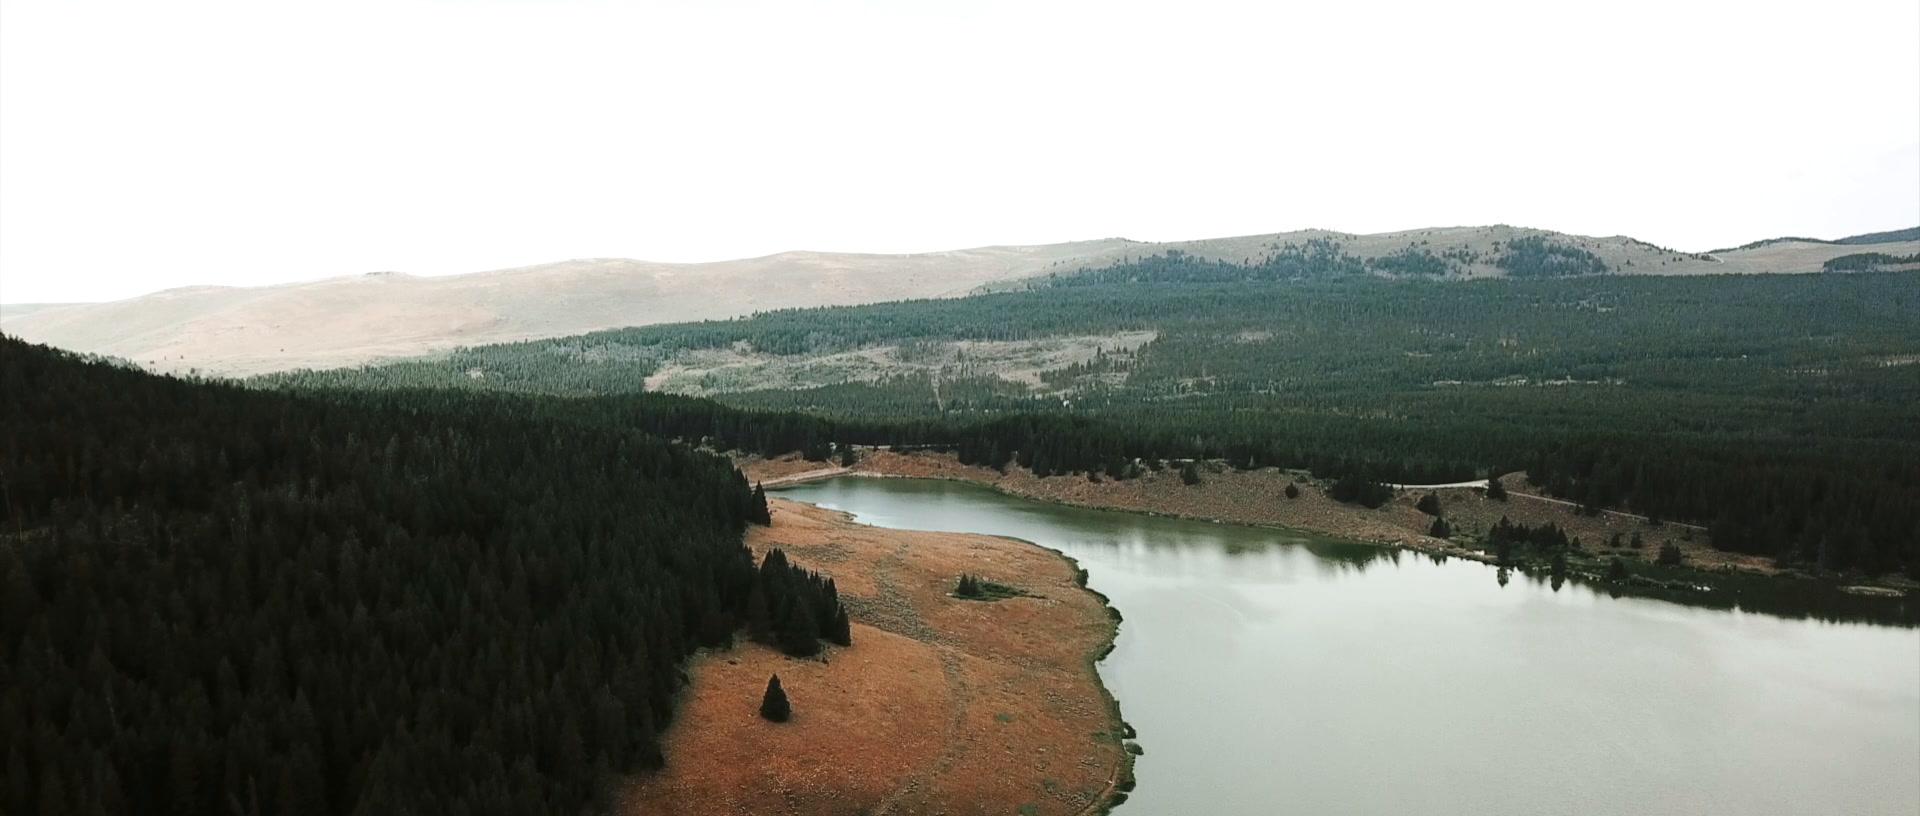 Jacob + Savannah | Ten Sleep, Wyoming | Meadowlark Ski Lodge